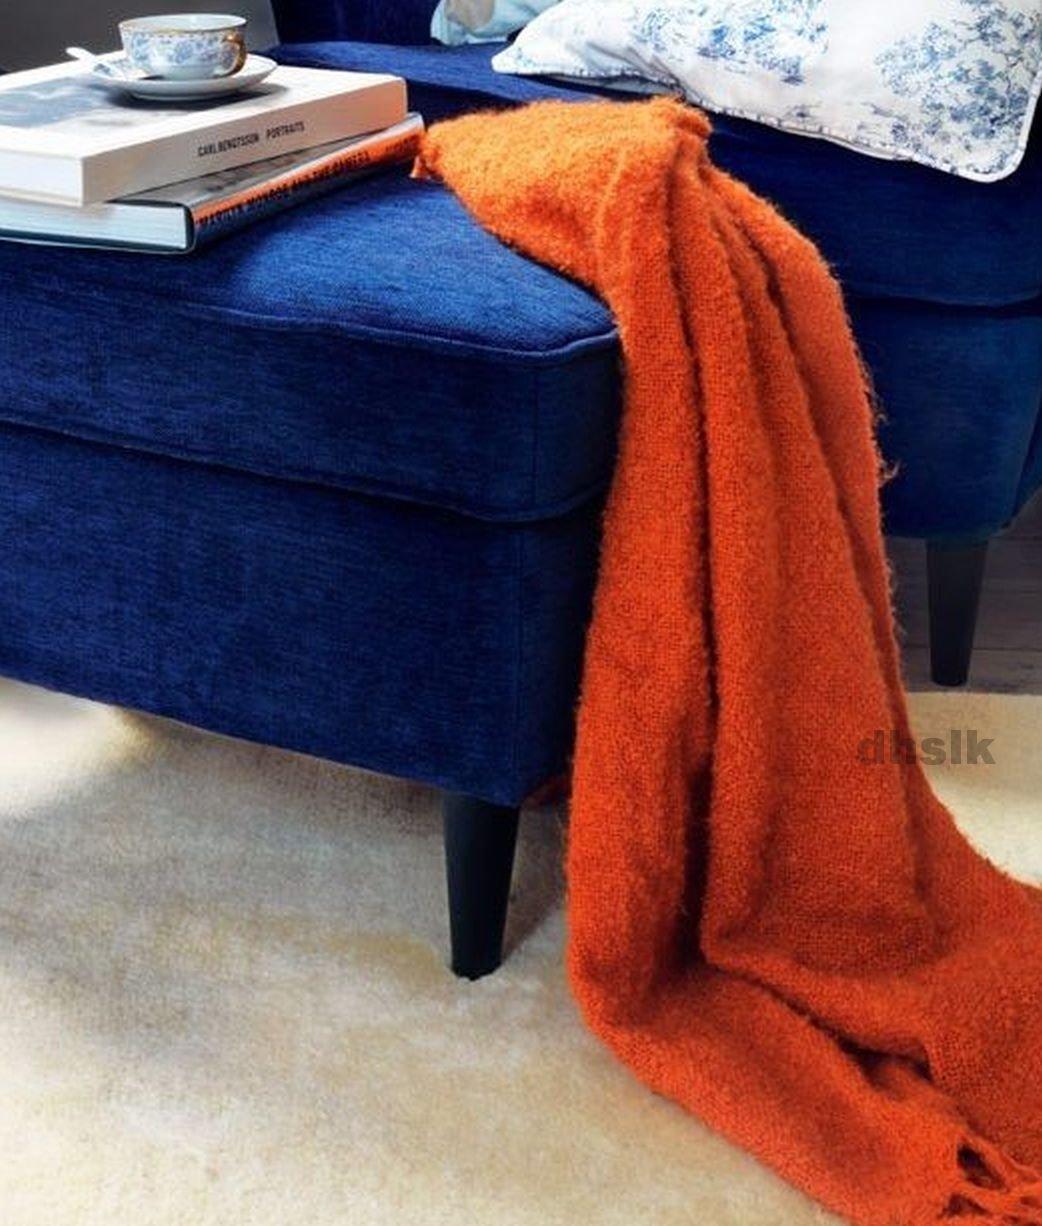 IKEA RITVA ORANGE Throw BLANKET Afghan SOFT Mohair Blend